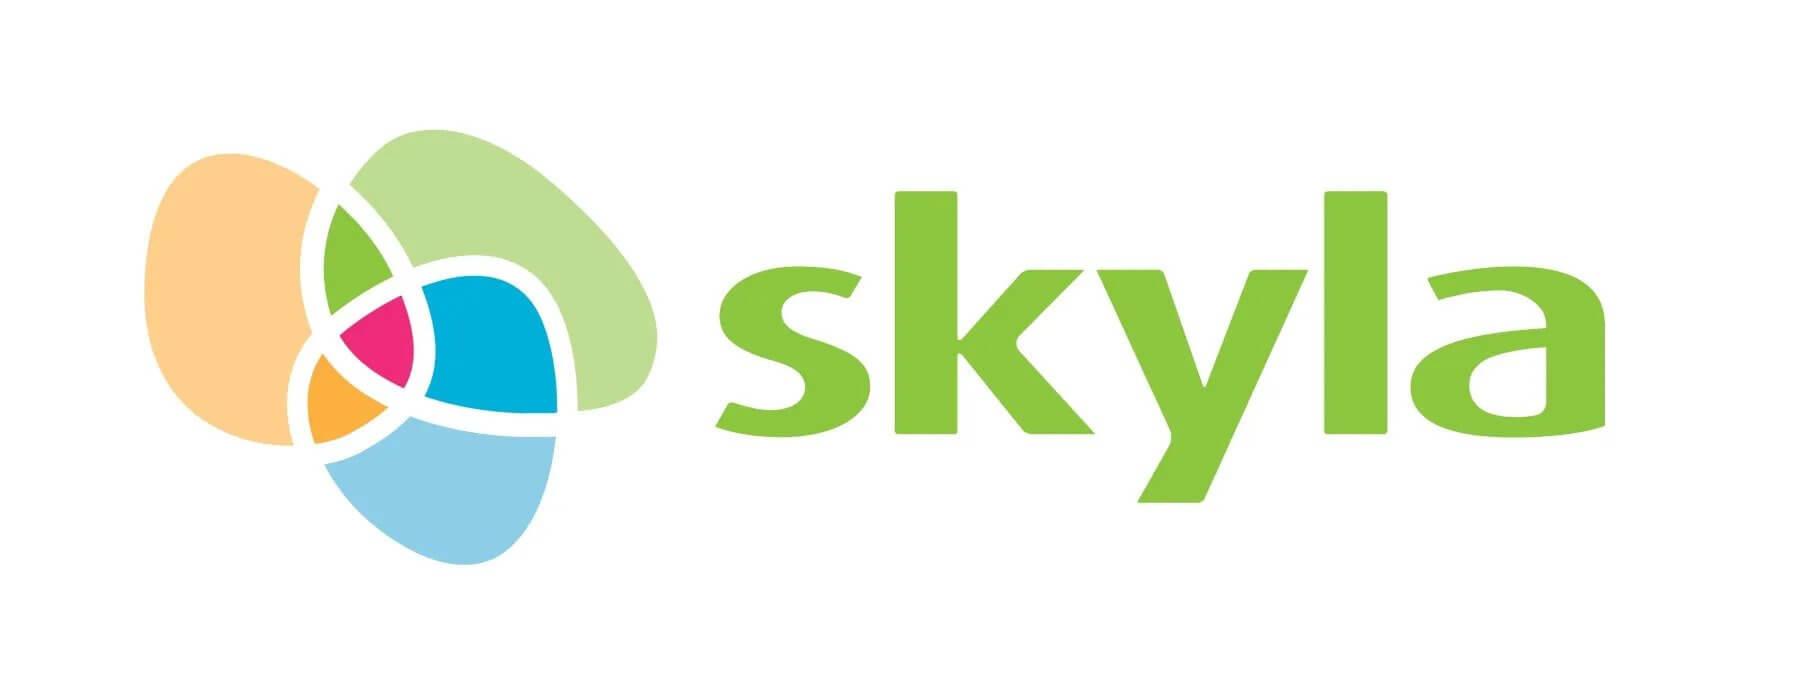 Skyla logo